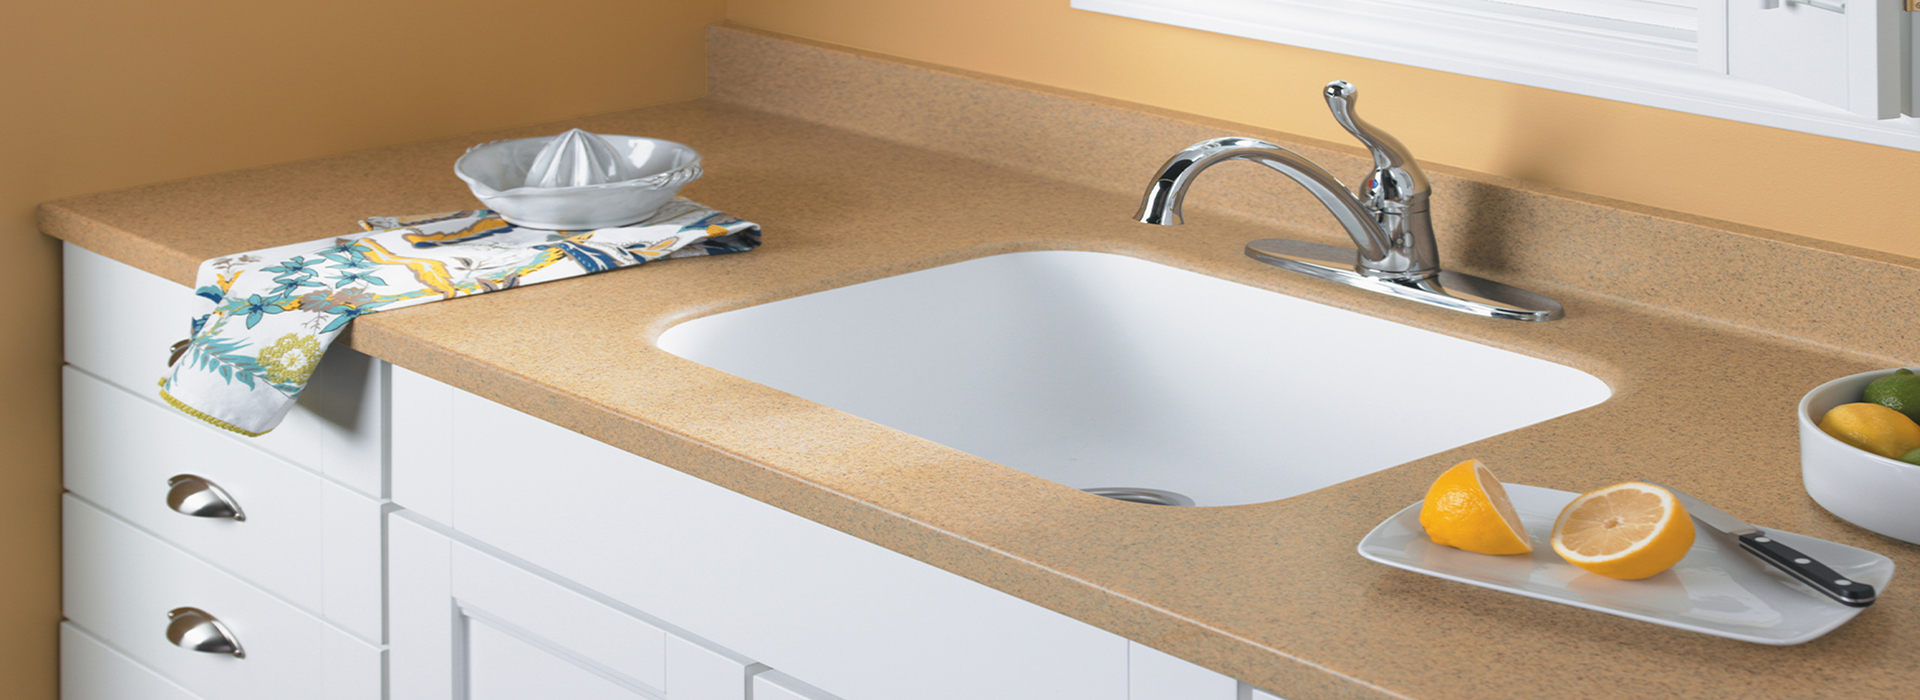 Kitchen sink with lemons K080 306 Ginger Root Mist Formica Solid Surfacing